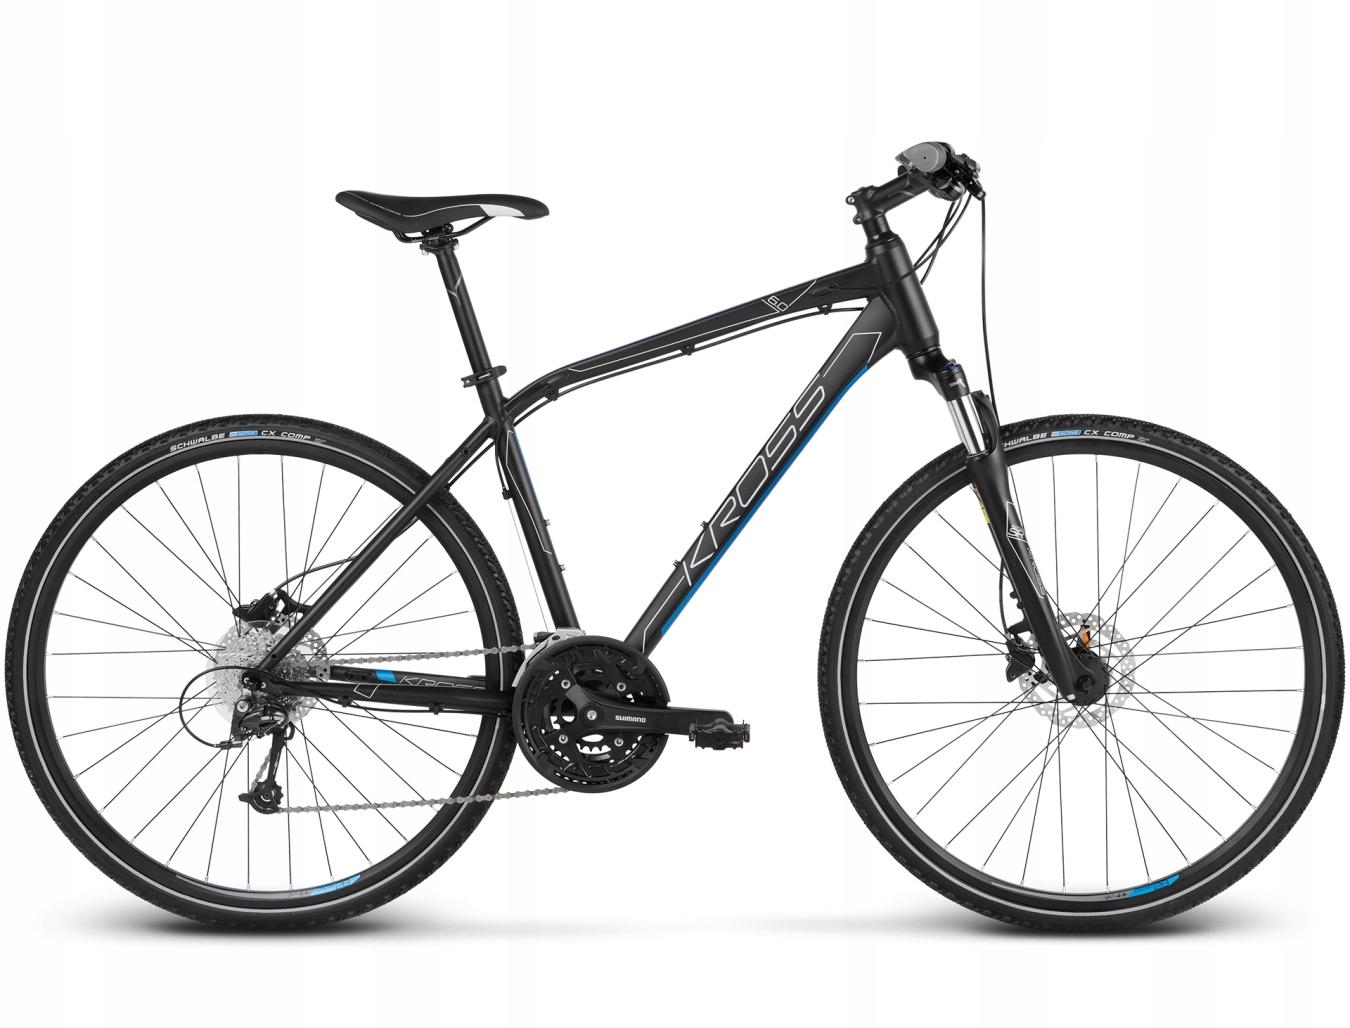 Rower Turystyczny Kross Evado 6.0 + Gratisy!!